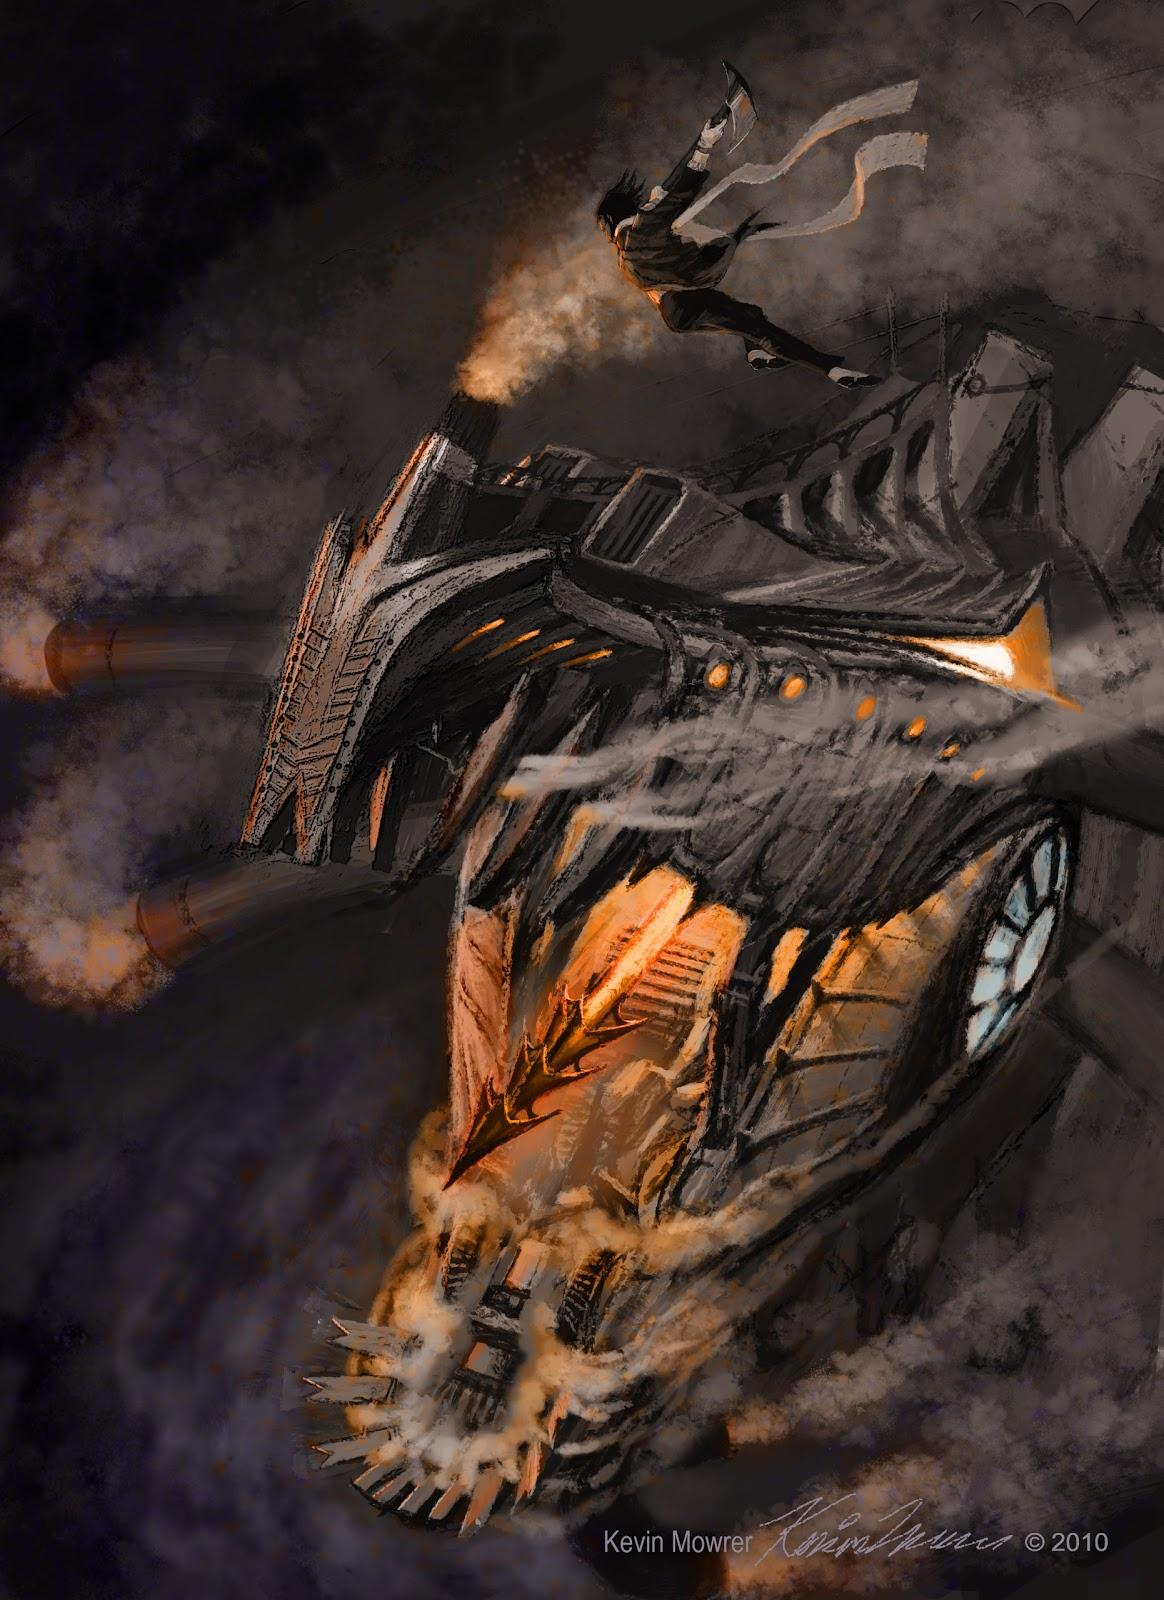 Dragon S Crown Gets New Character Art Screens Tarot: Steampunk Dragons